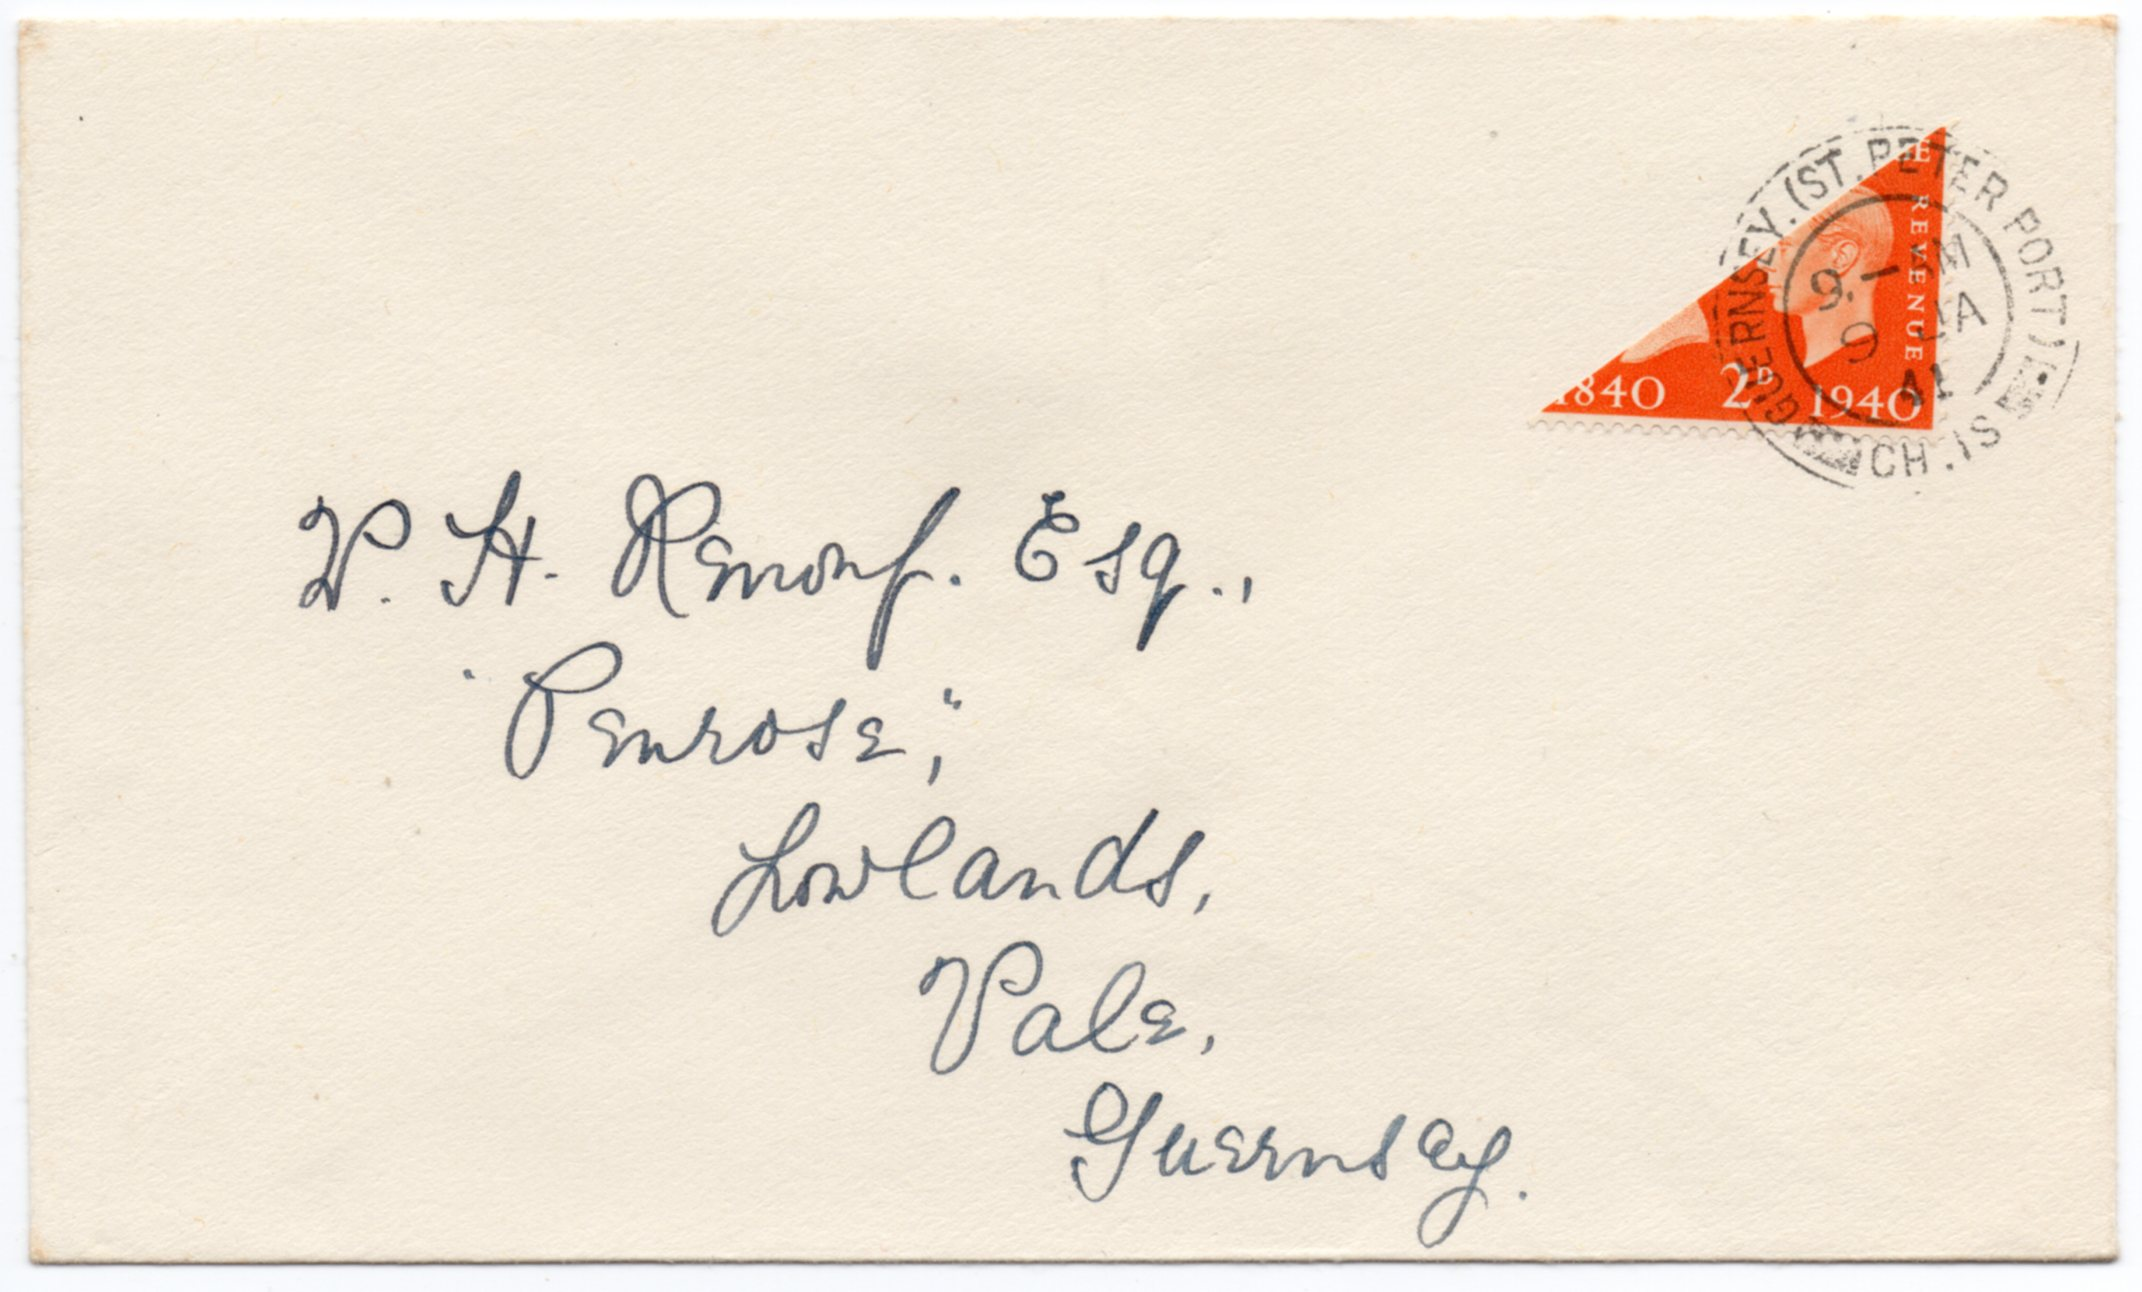 1940 2d ORANGE CENTENARY BISECT ON ST.PETER PORT COVER